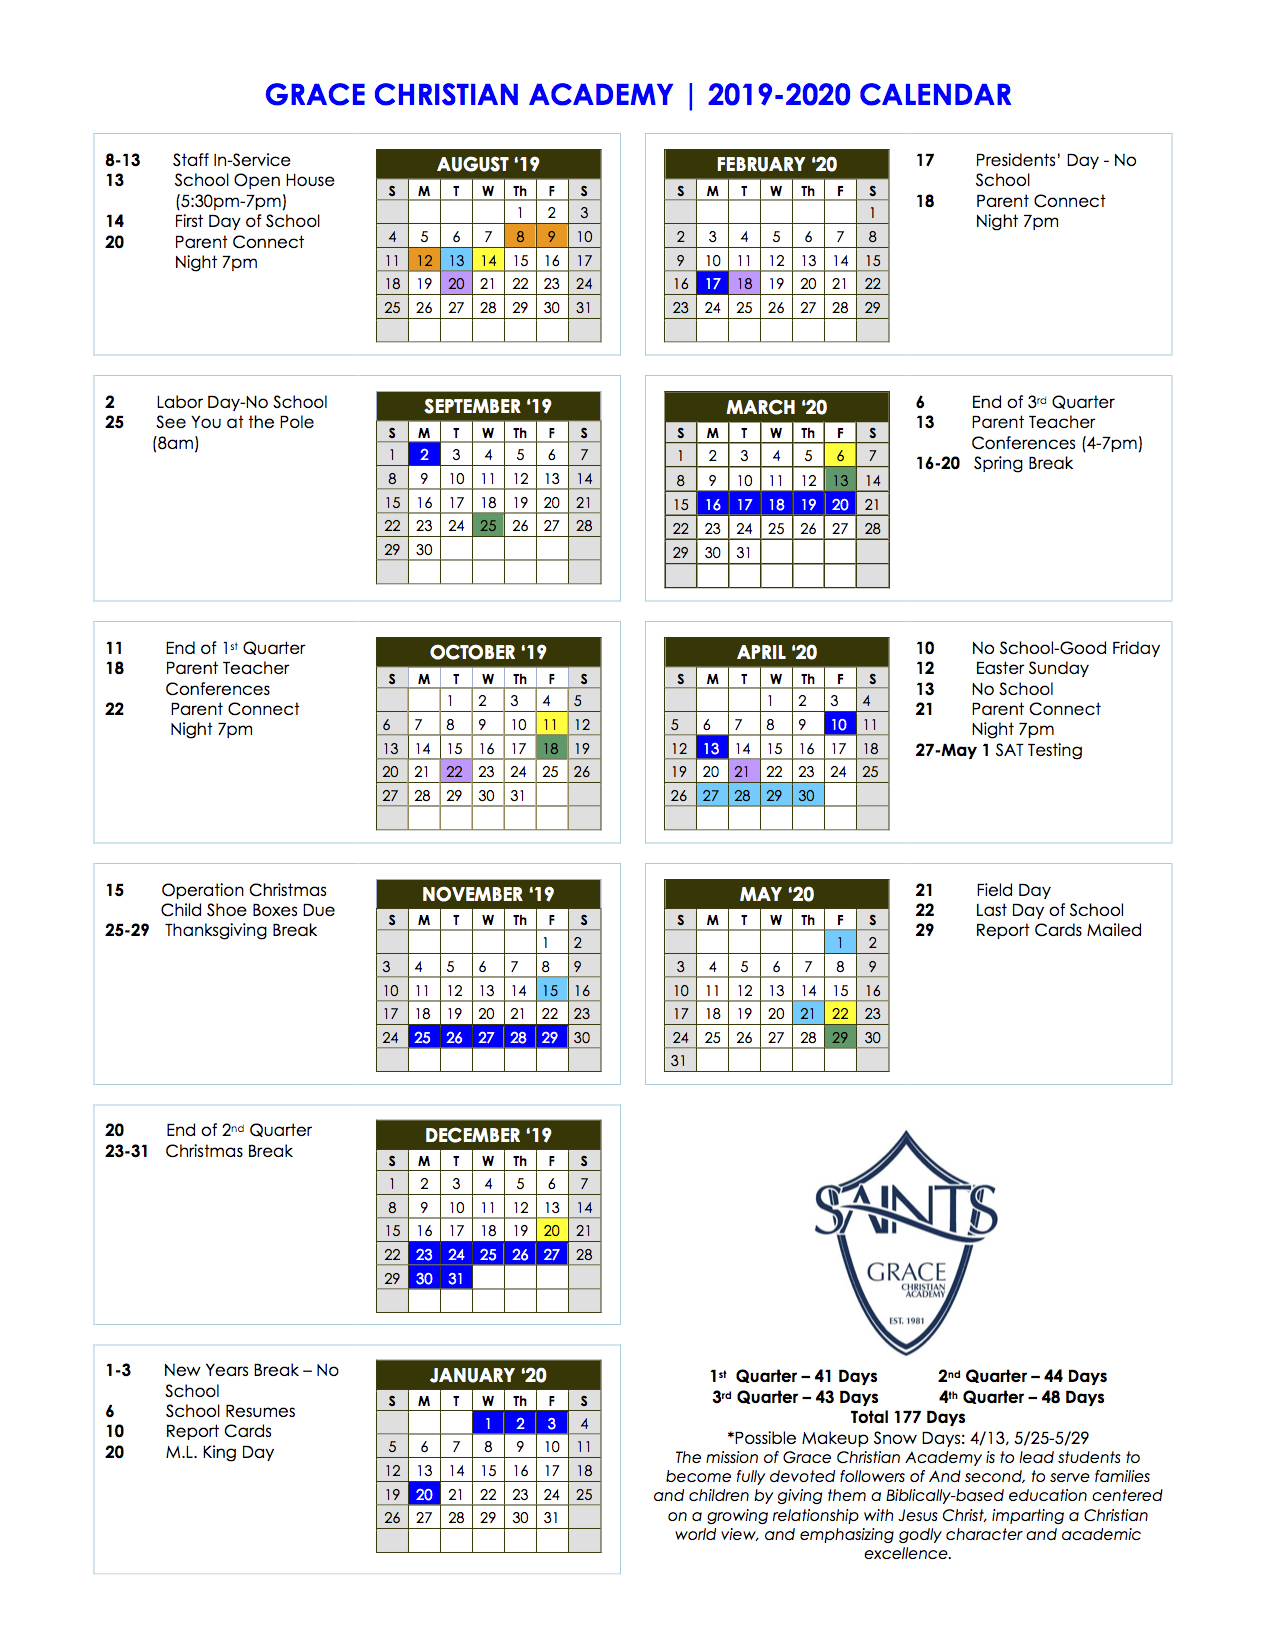 GCA School Calendar 2019-2020.jpg